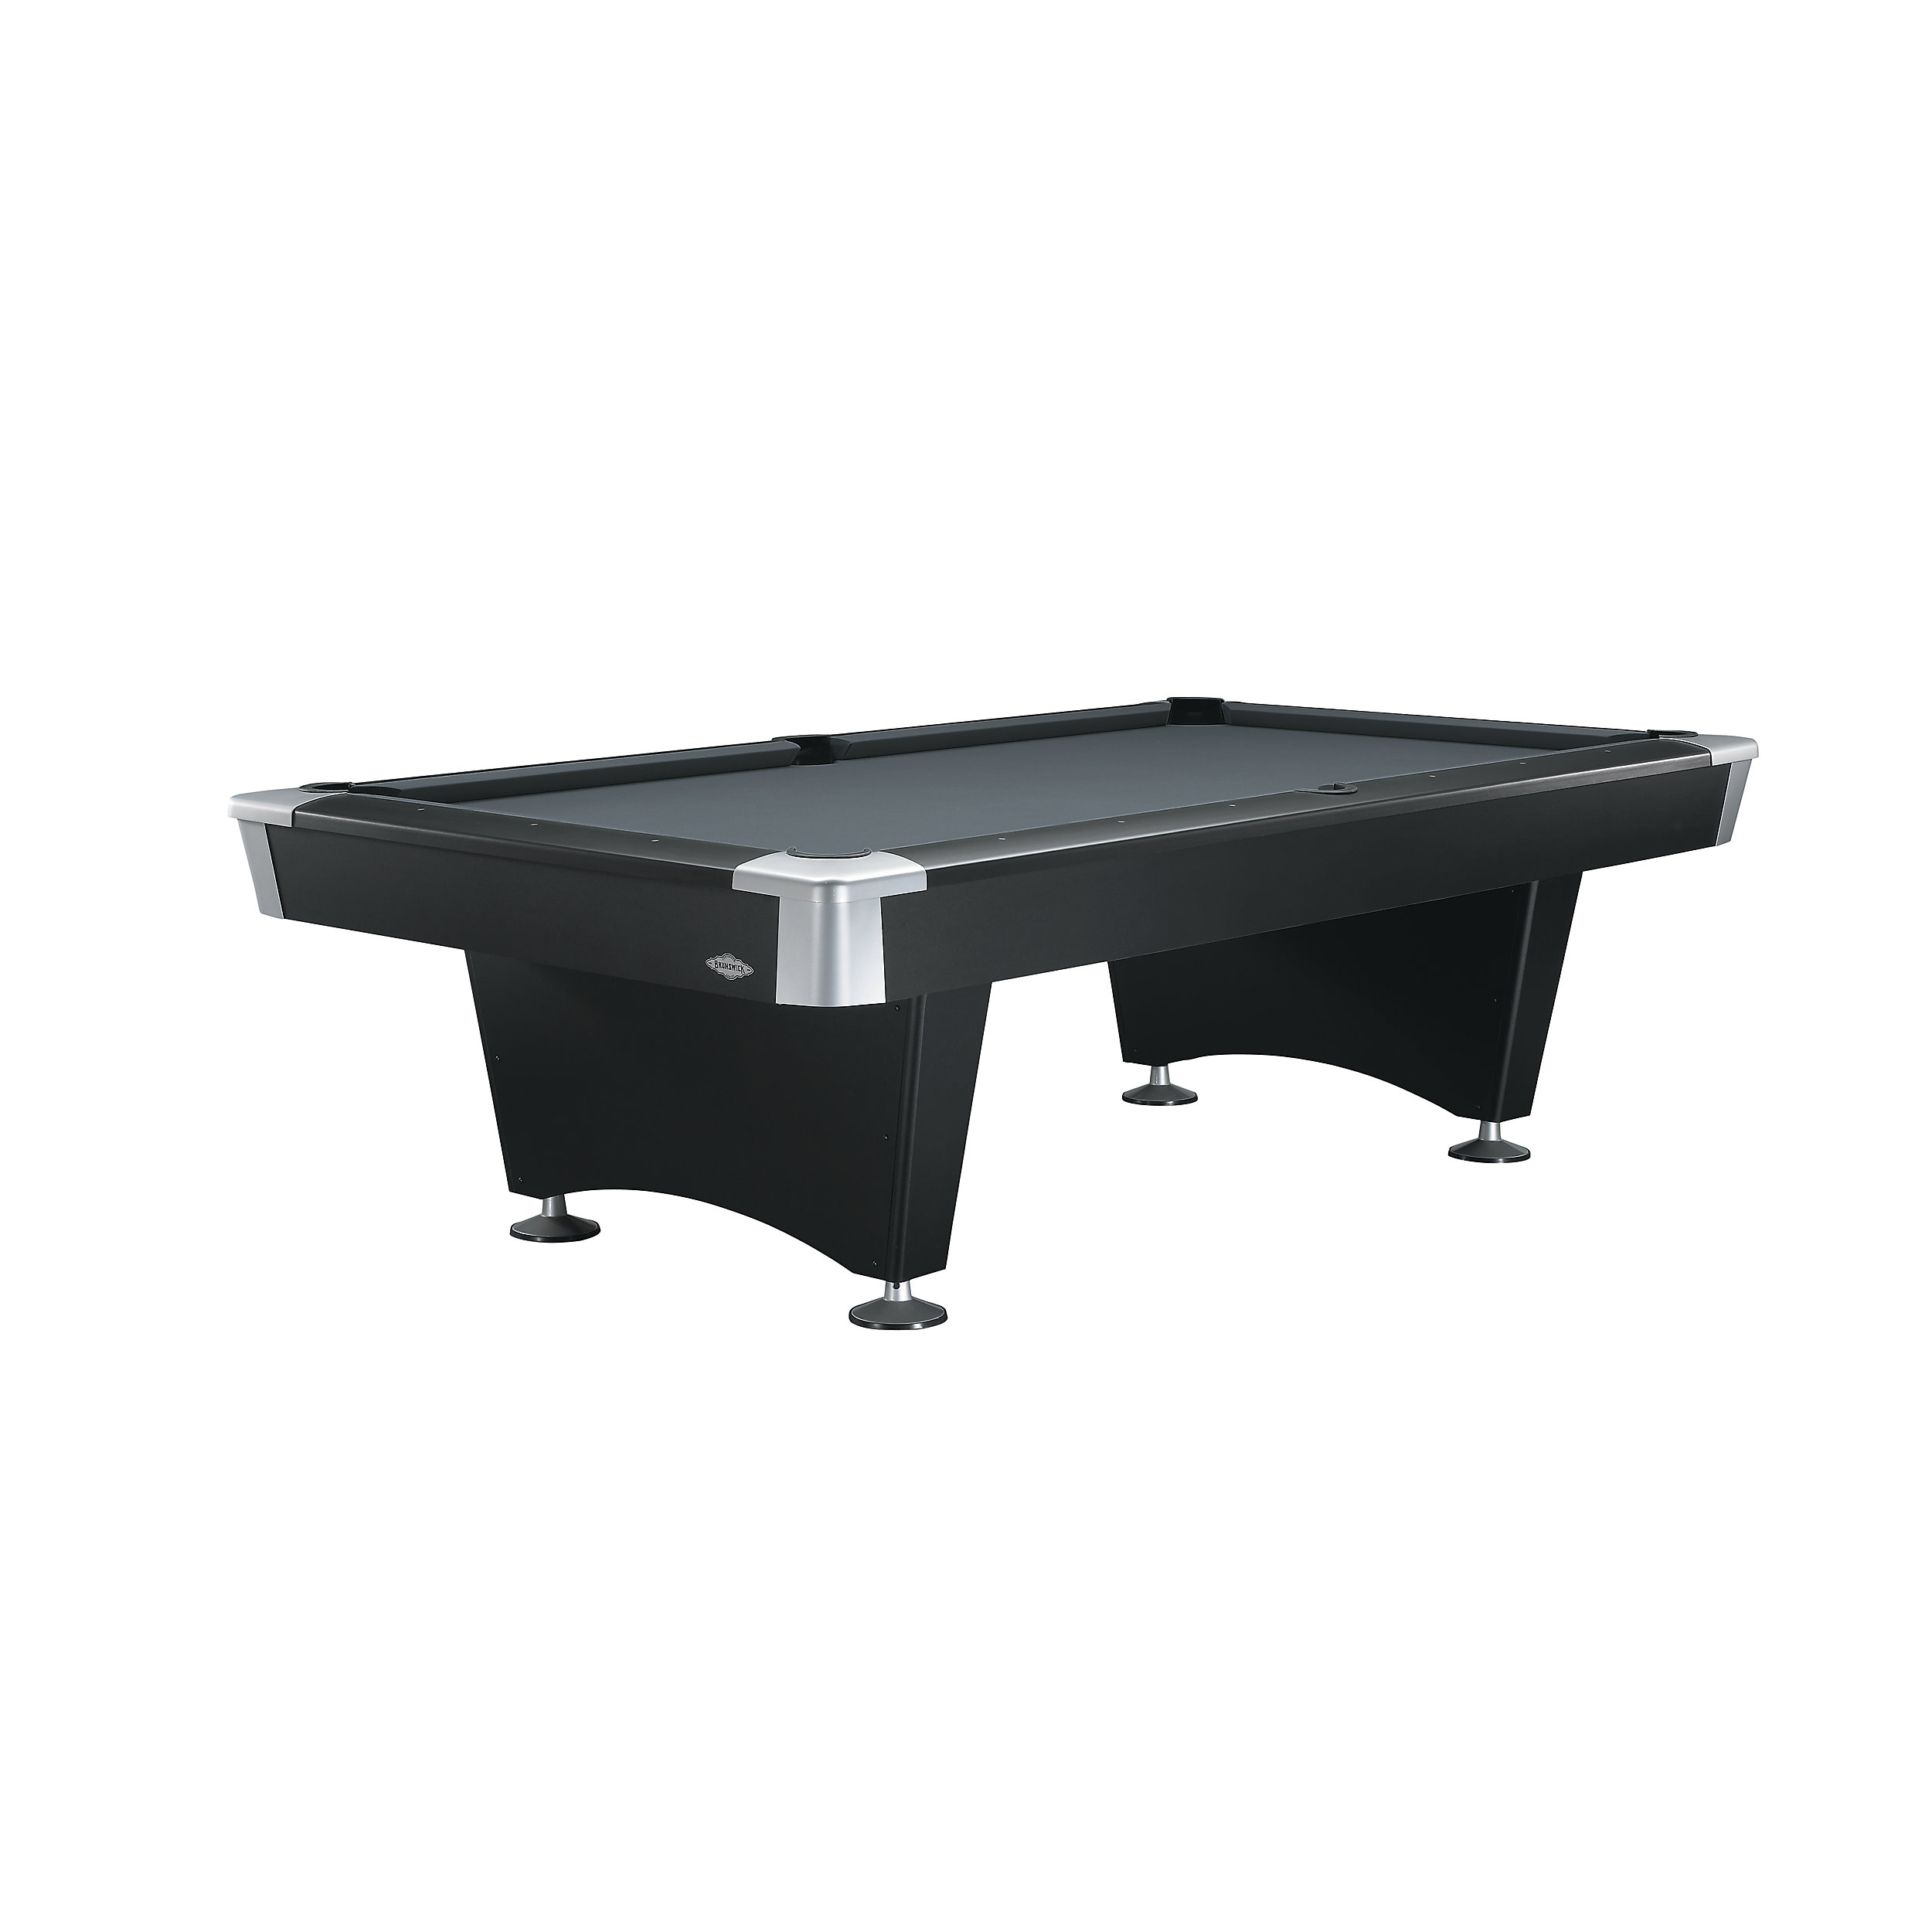 Black Pool Table Brunswick Black Wolf Contemporary Pool Table - Brunswick pool table reviews